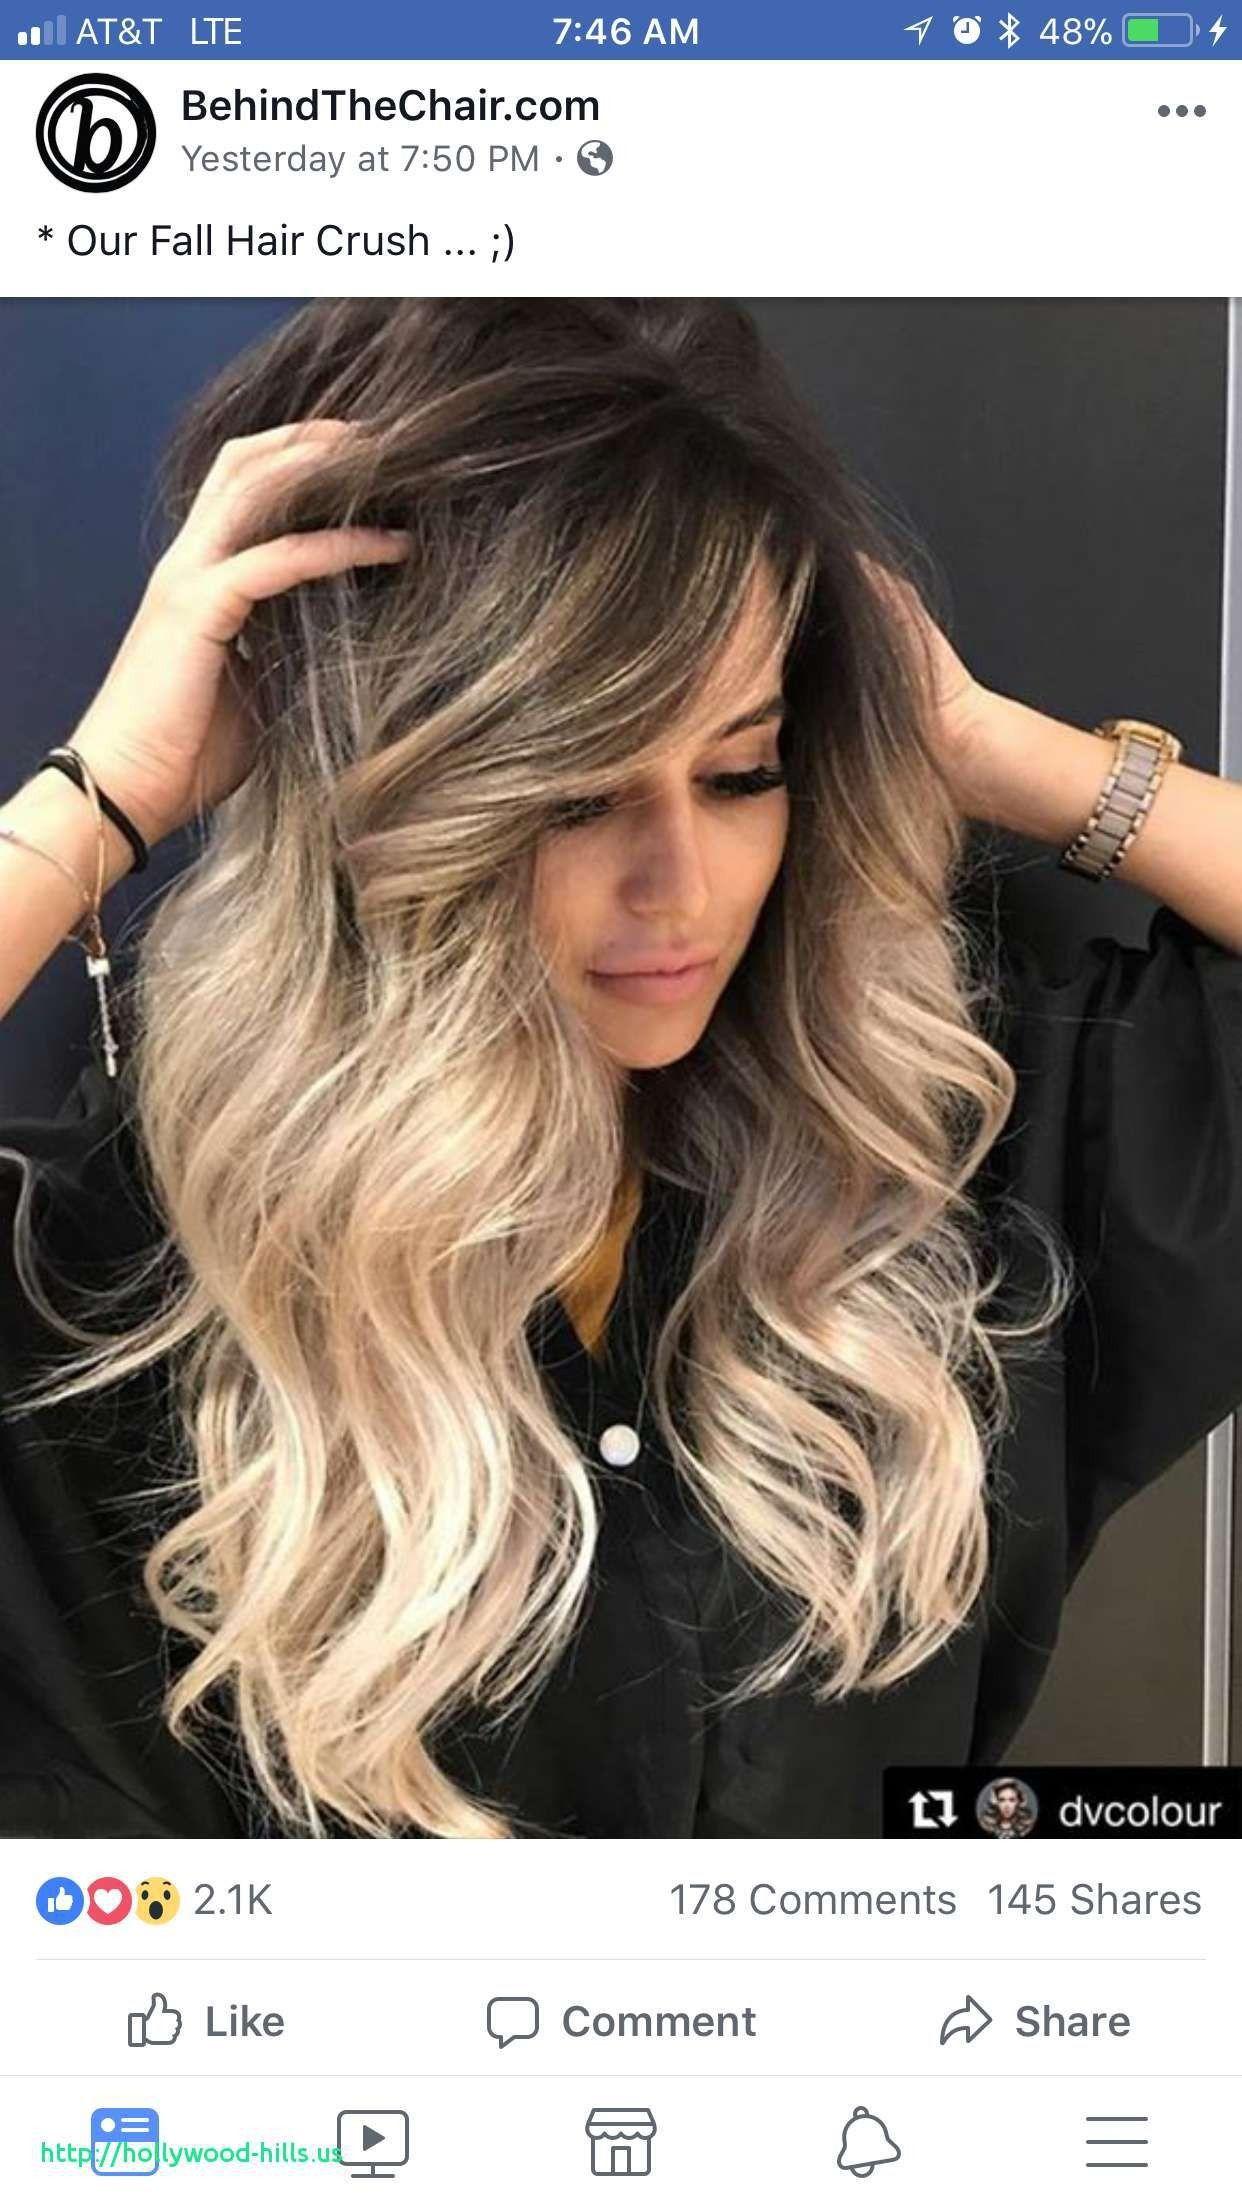 Dm haarfarbe 1 tag